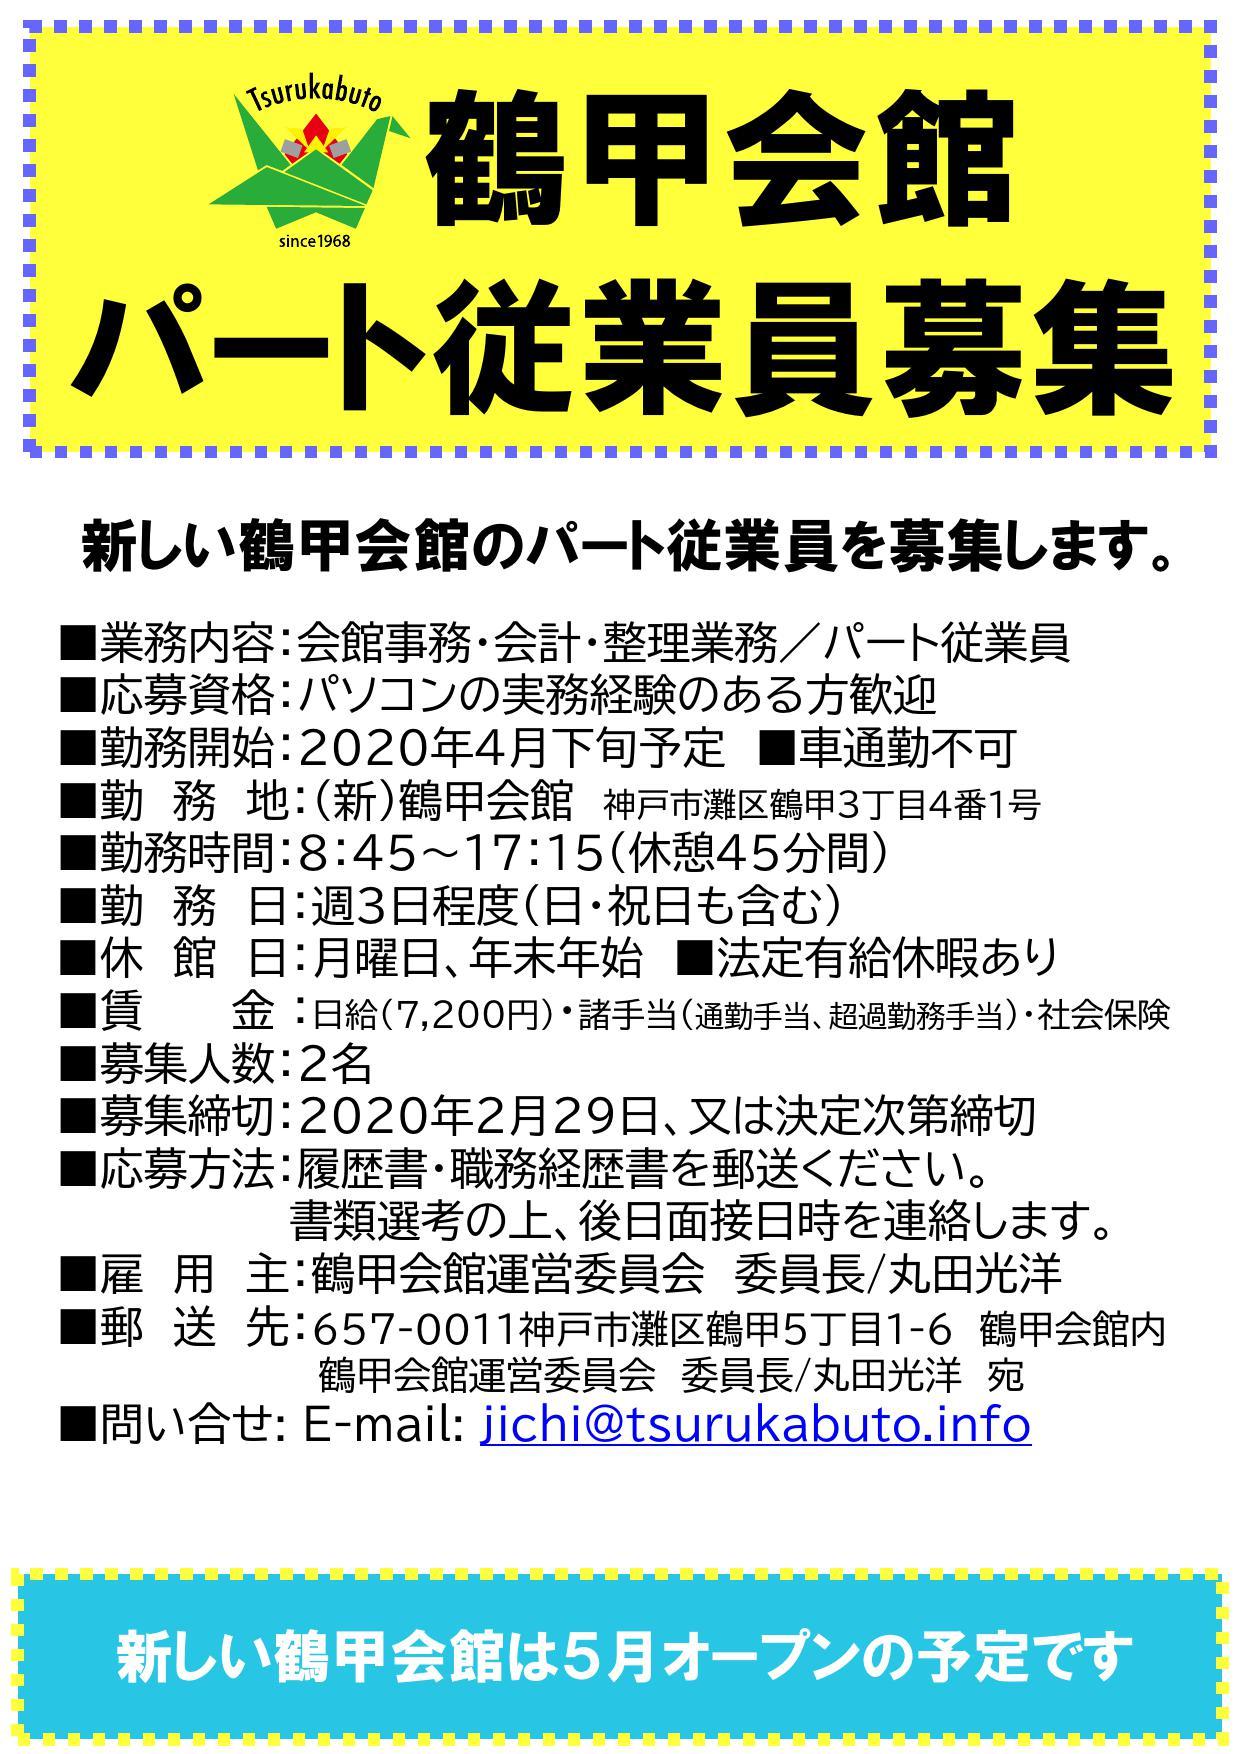 Microsoft PowerPoint - 会館パート募集_000001